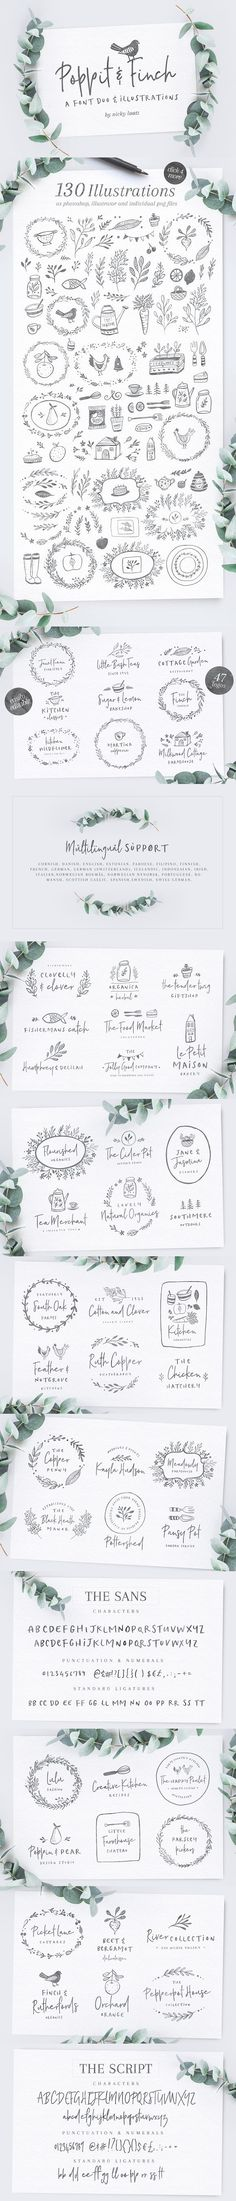 Poppit & Finch Fonts & Illustrations. Best Fonts